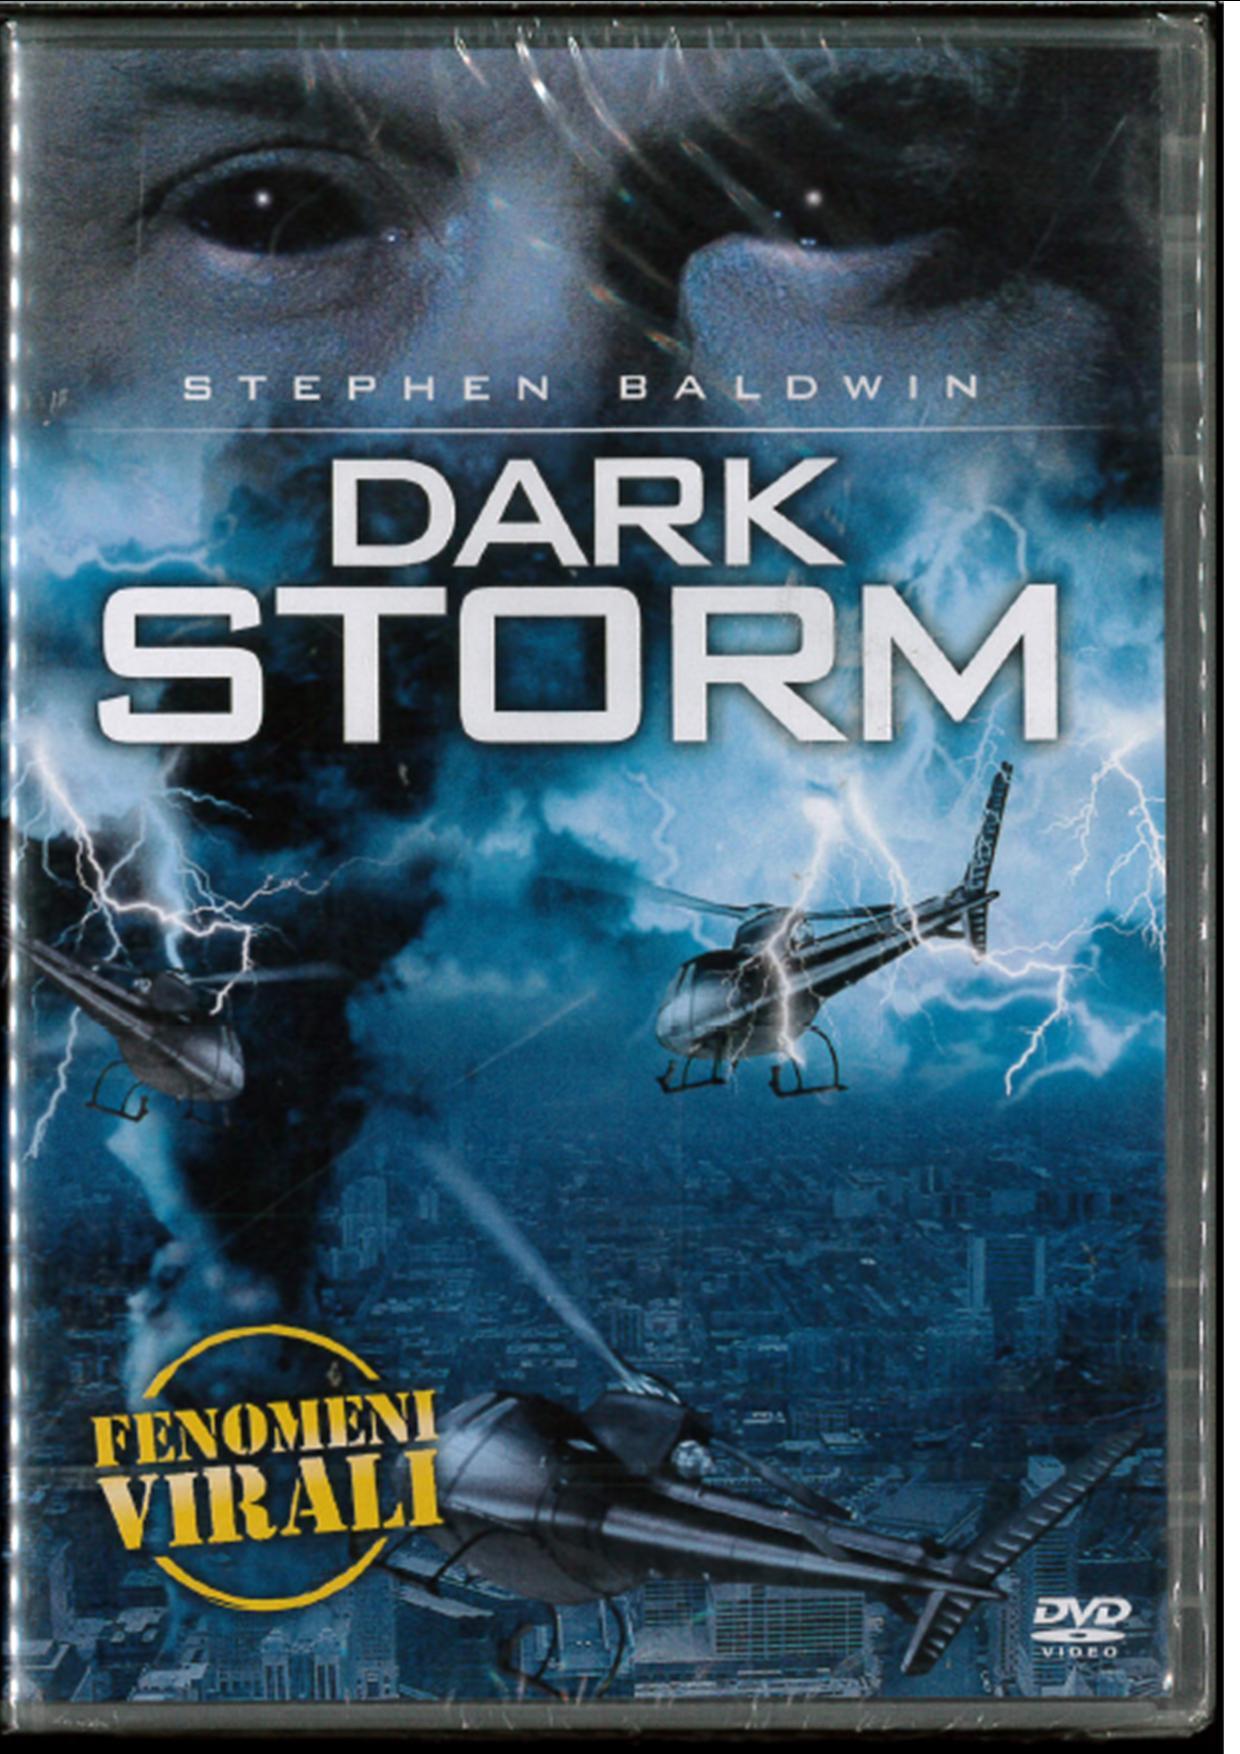 DARK STORM (DVD)